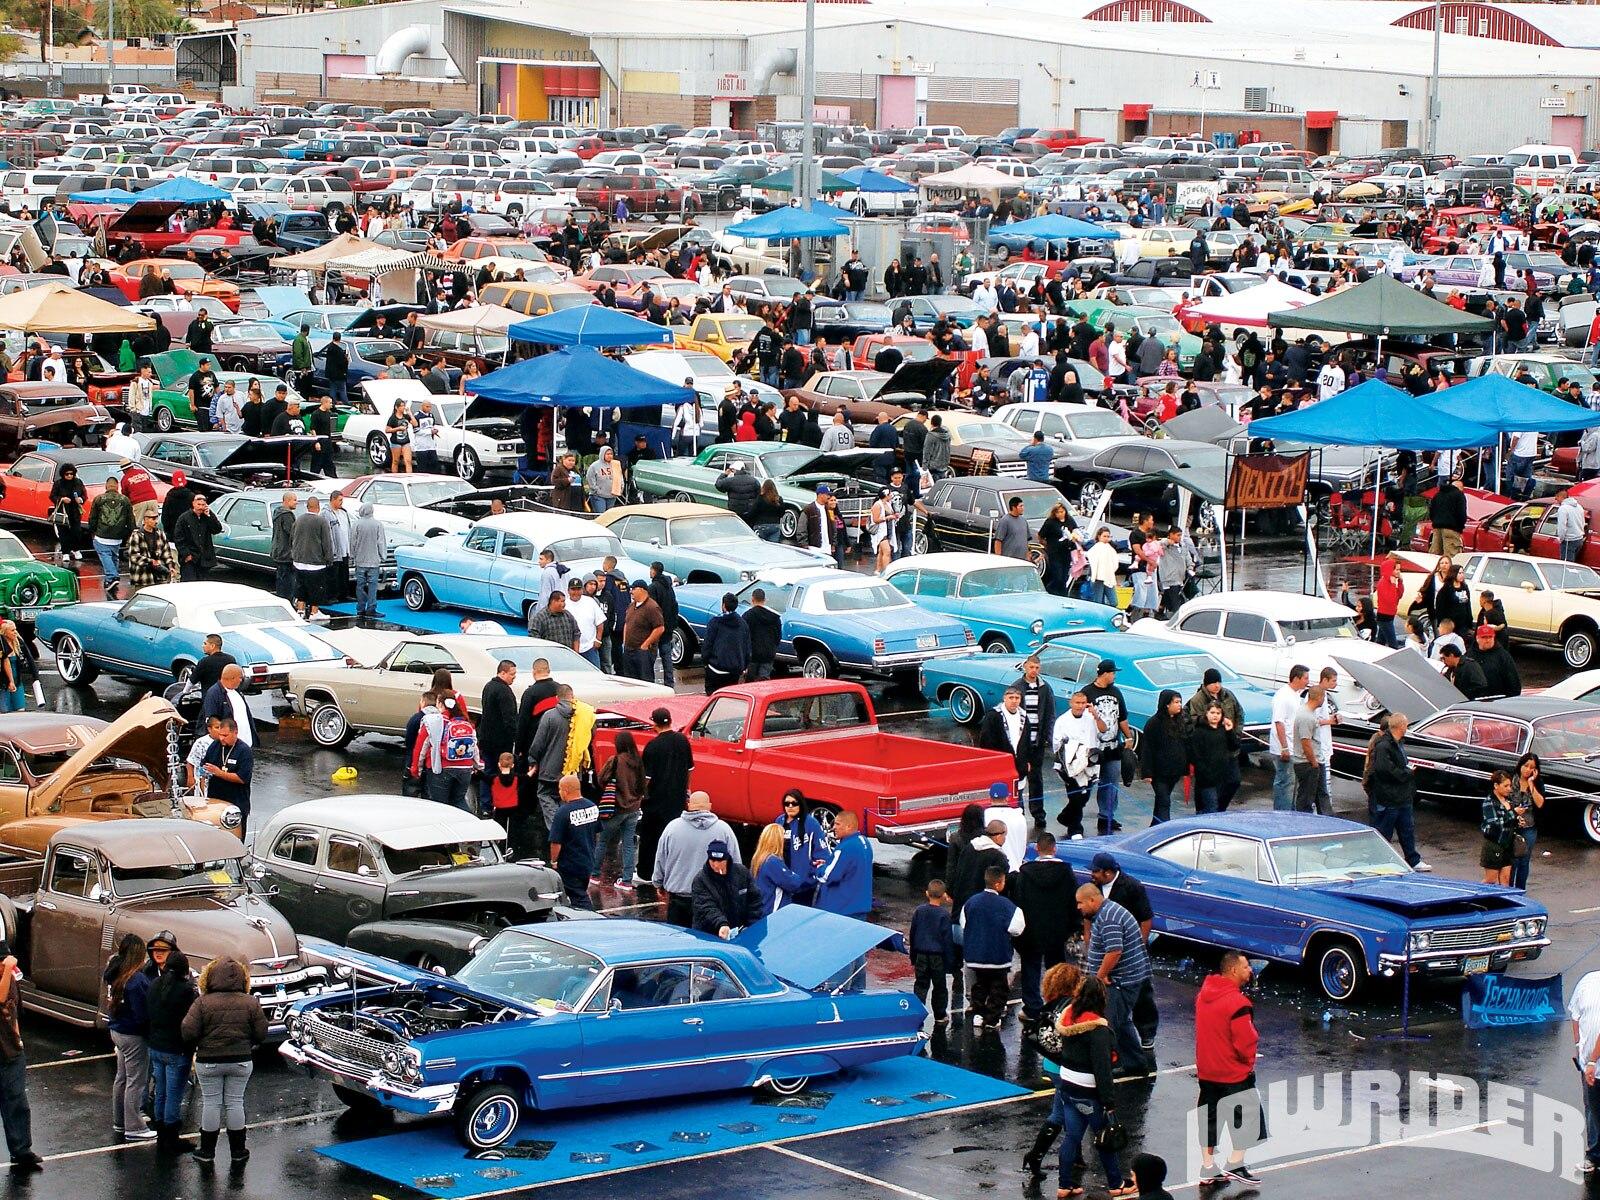 lrmp_1008_04_o-phoenix_arizona_2010-crowds5